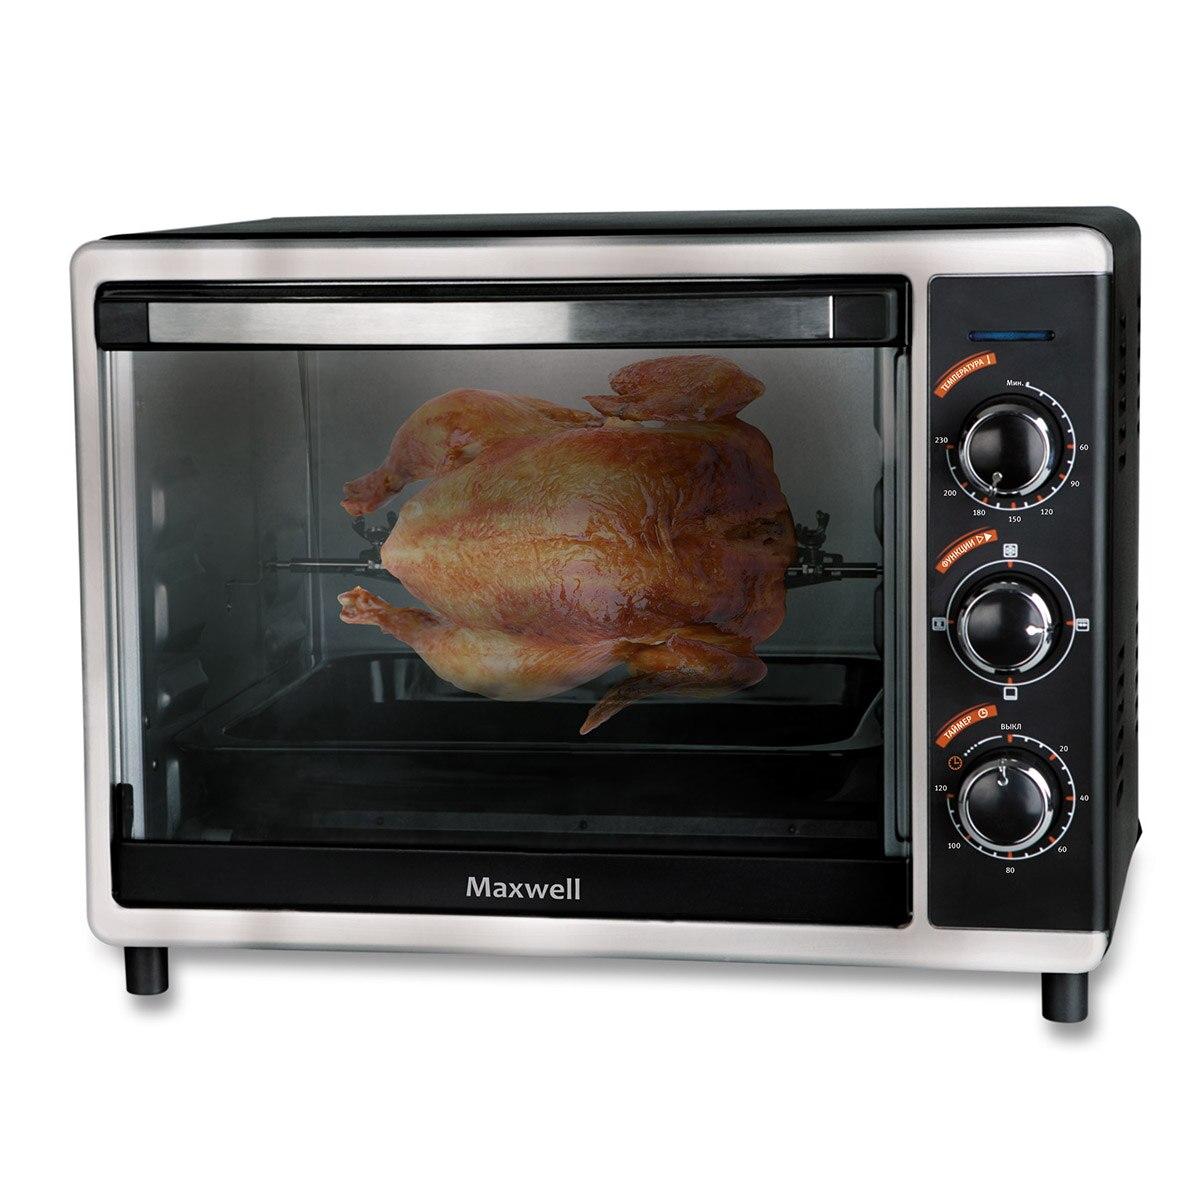 Mini oven MAXWELL MW-1851 BK стоимость